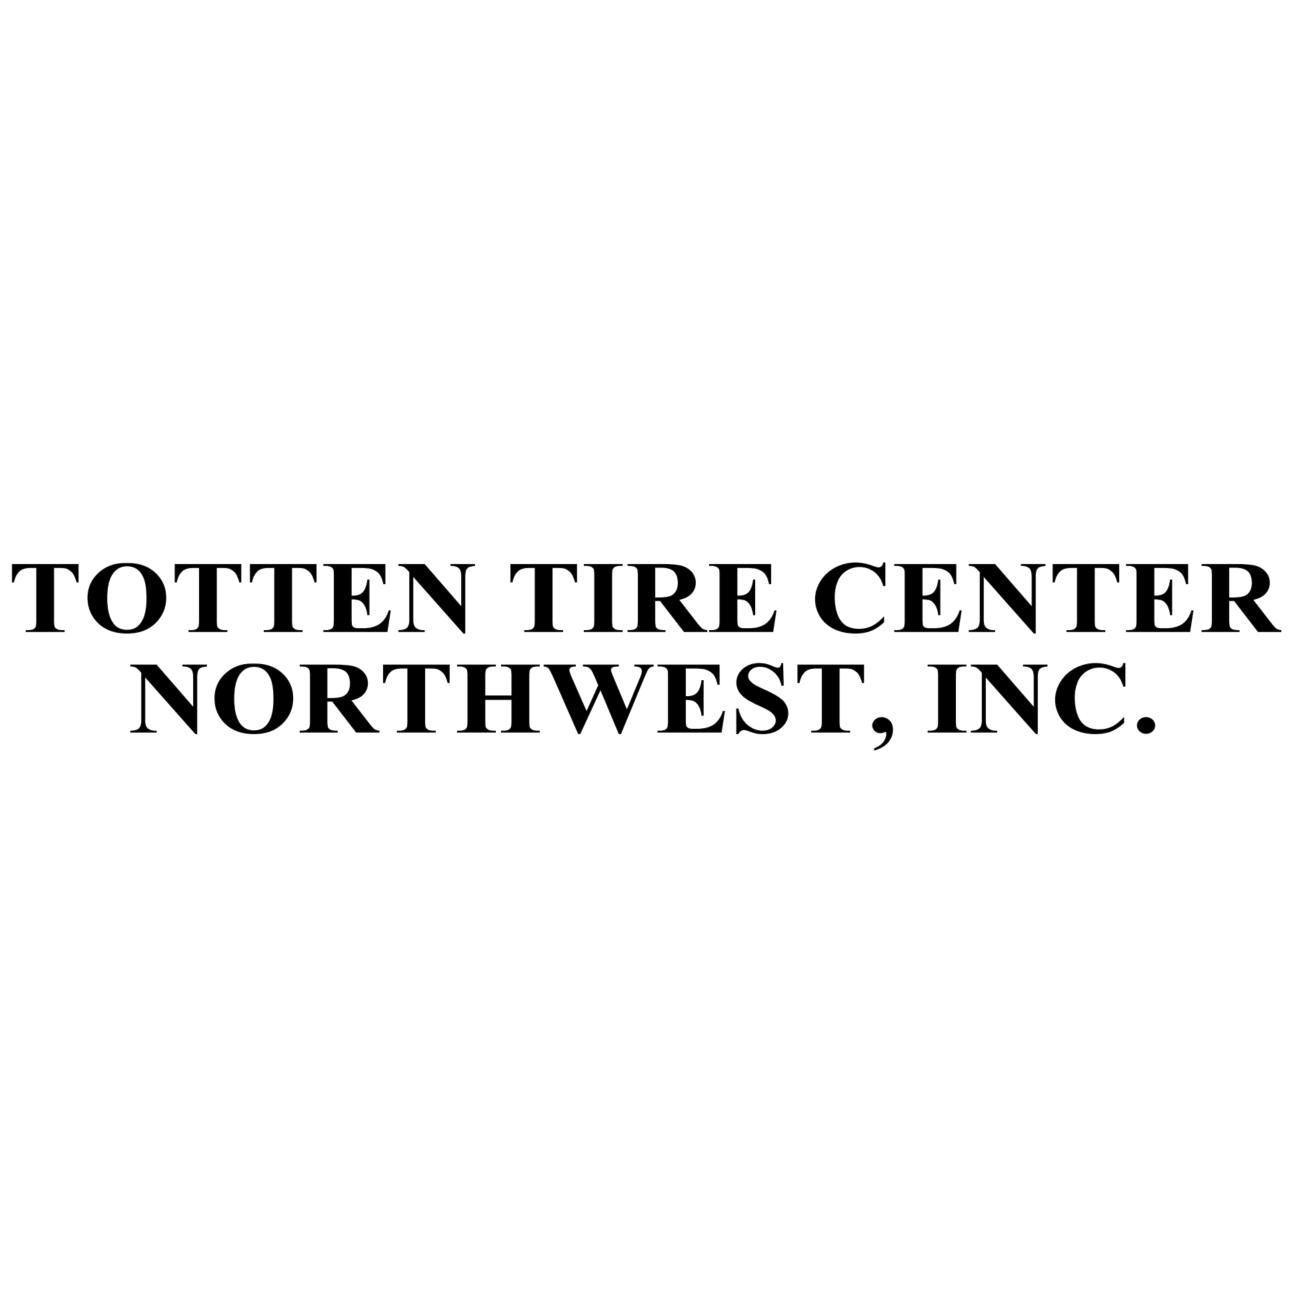 Totten Tire Center Northwest - Saginaw, MI - Tires & Wheel Alignment